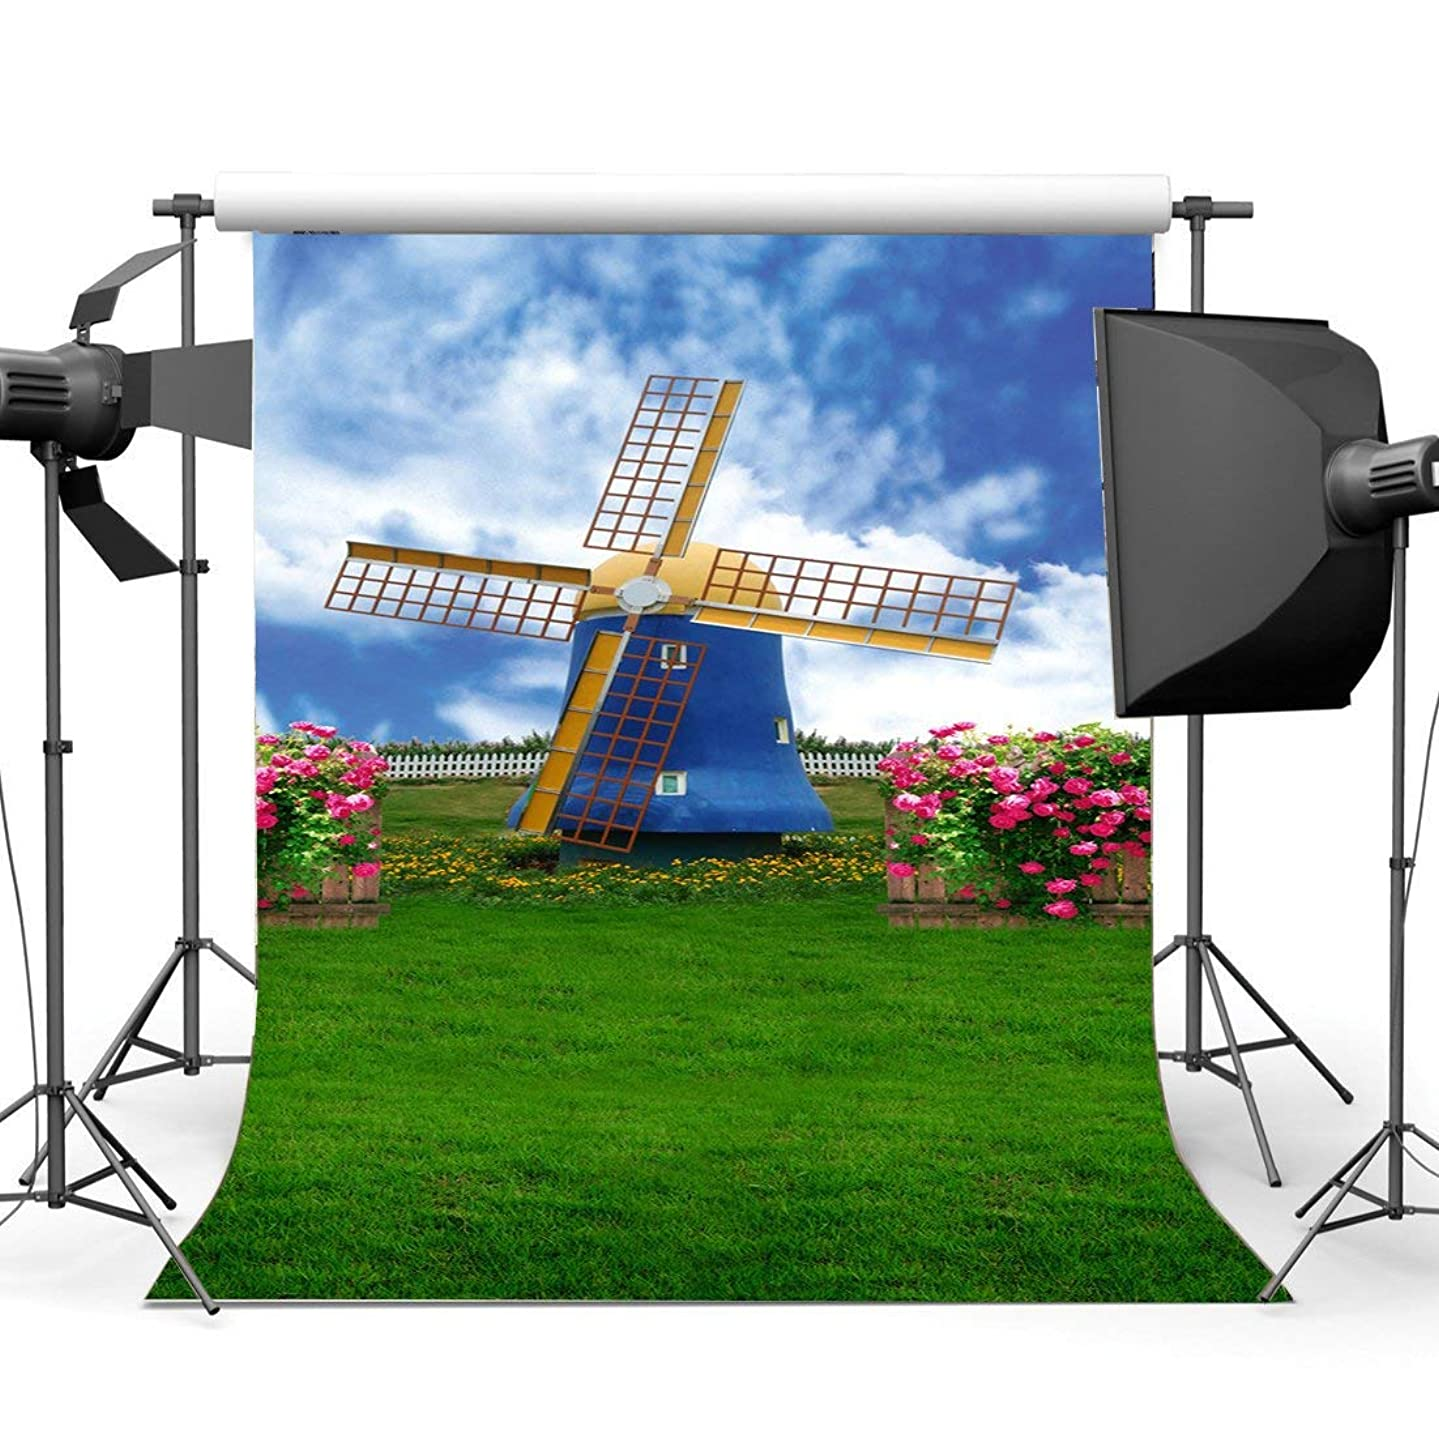 SZZWY 5X7FT/150X210cm Vinyl Photography Backdrop Dreamy Fairytale Dutch Windmill Flowers Grass Field Fantasy Backdrops Seamless Baby Kids Princess Wedding Background Photo Studio Props CA776